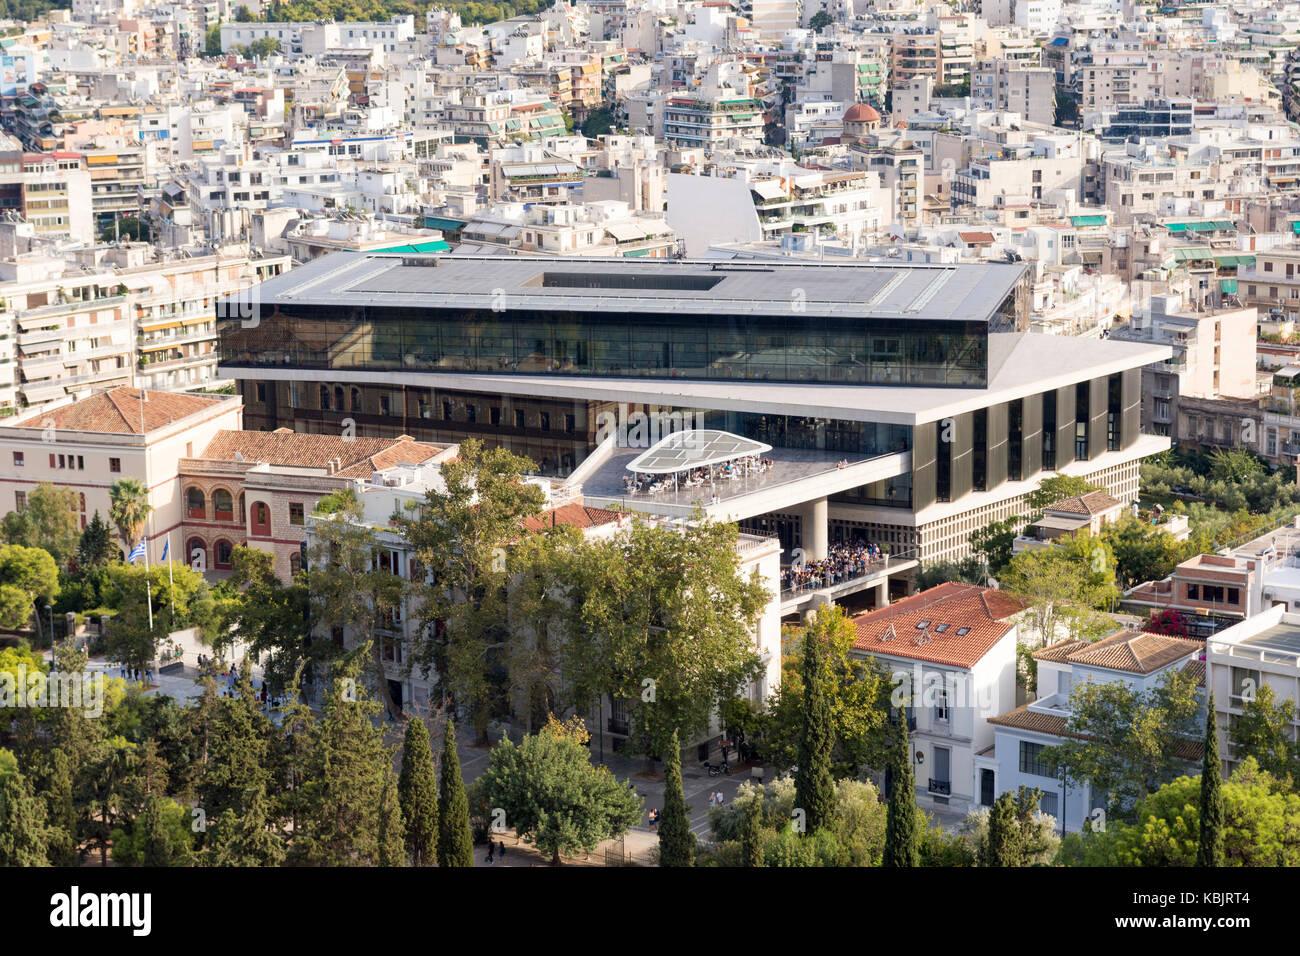 acropolis museum of athens greece - Stock Image